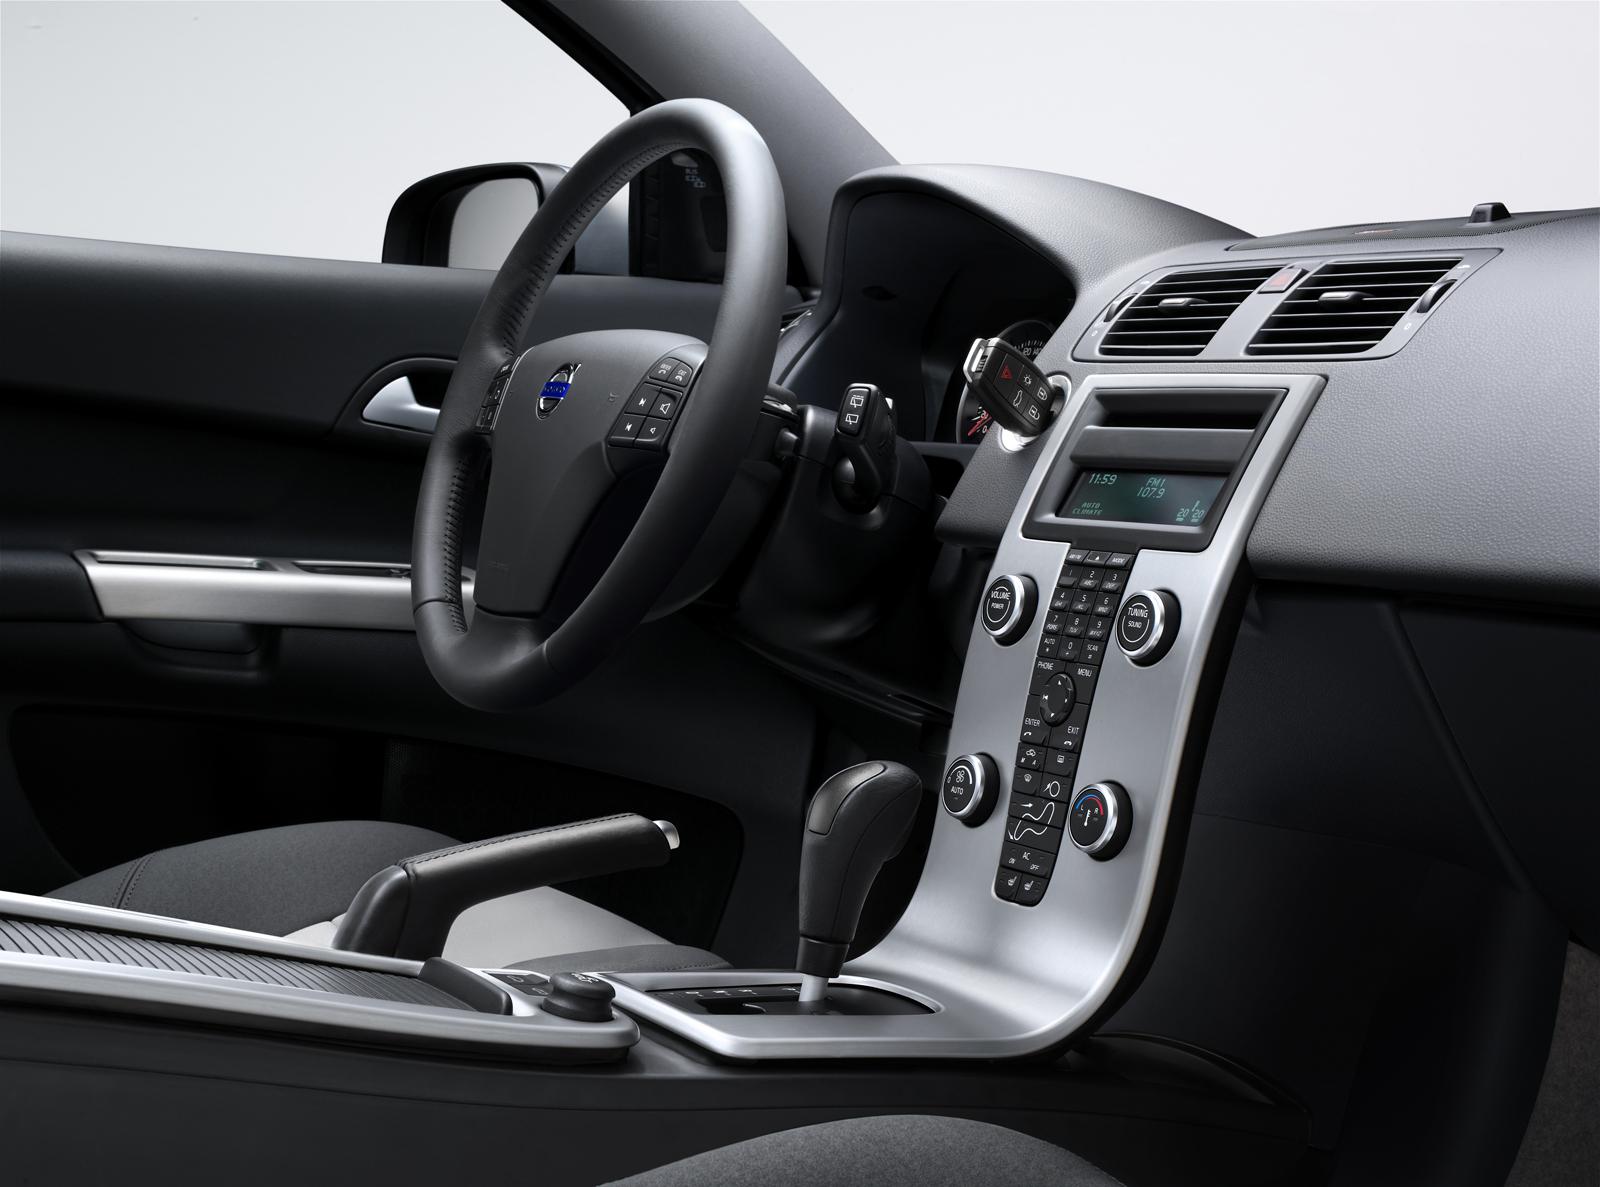 Volvo C30 Interior Design Award Picture 34452